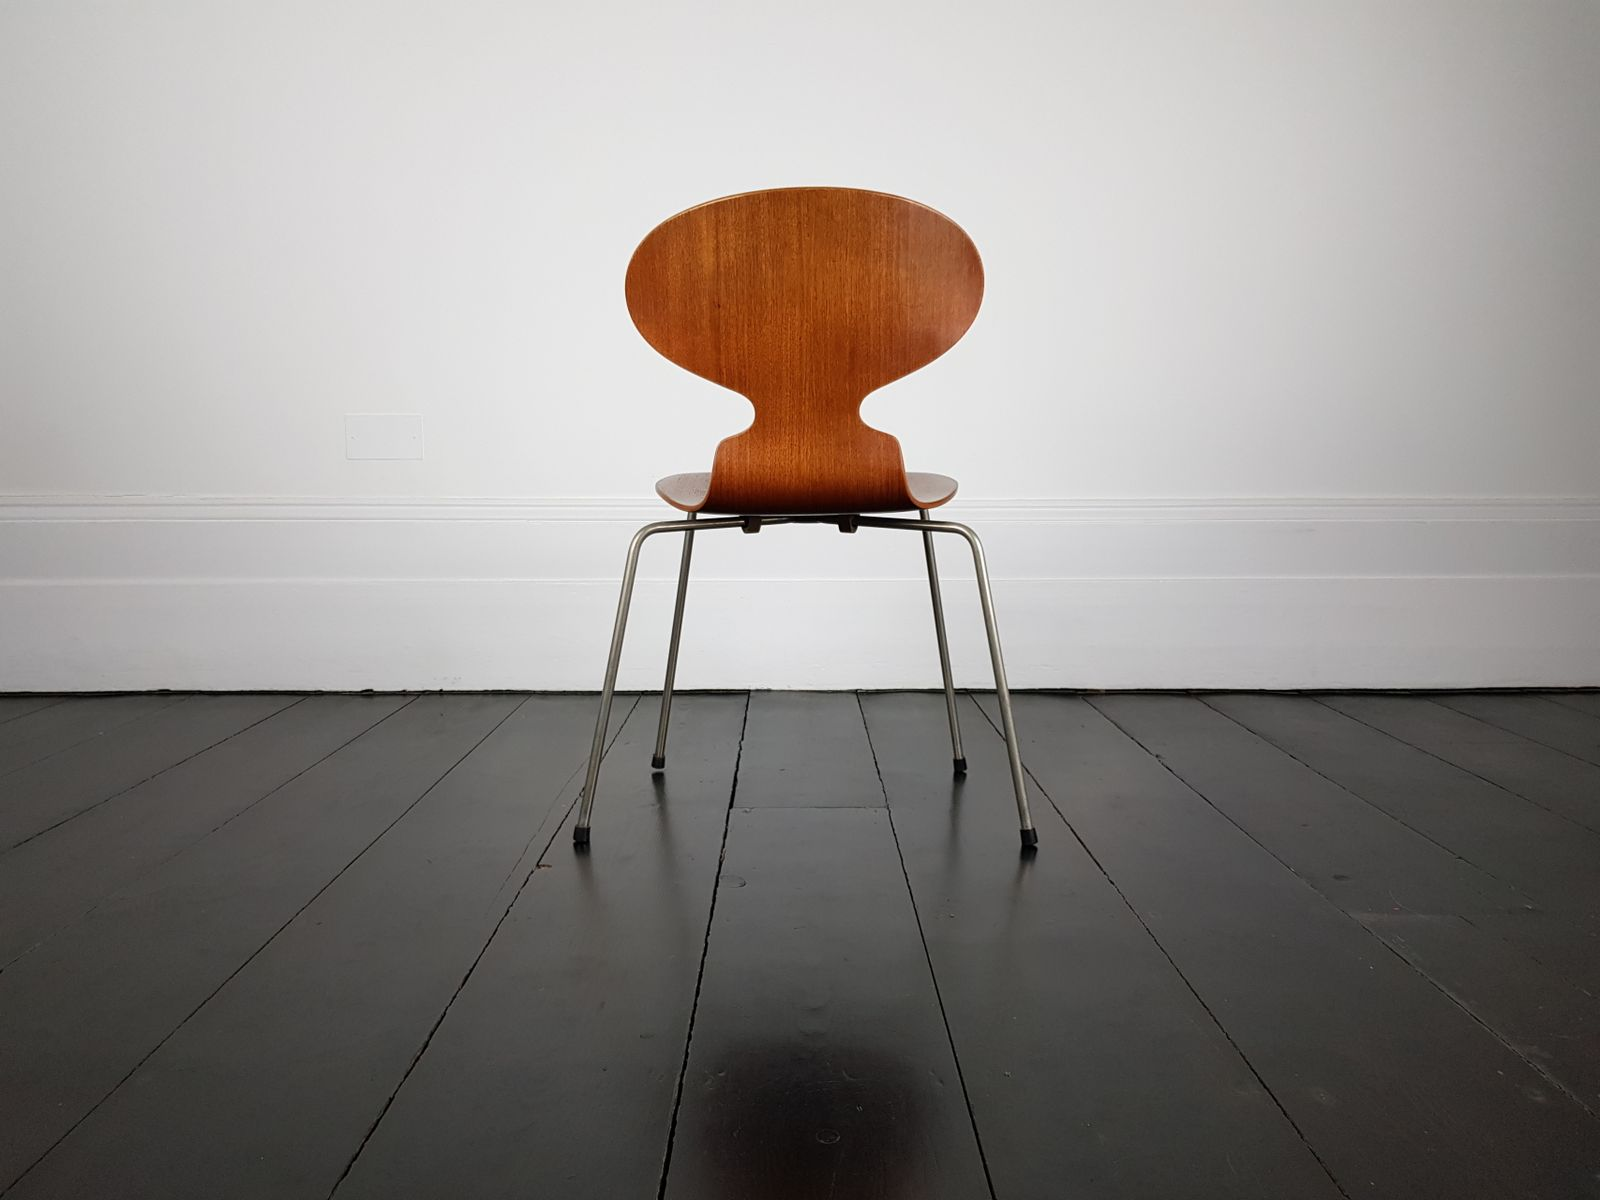 vintage model 3100 ant chair by arne jacobsen for fritz hansen for sale at pamono. Black Bedroom Furniture Sets. Home Design Ideas